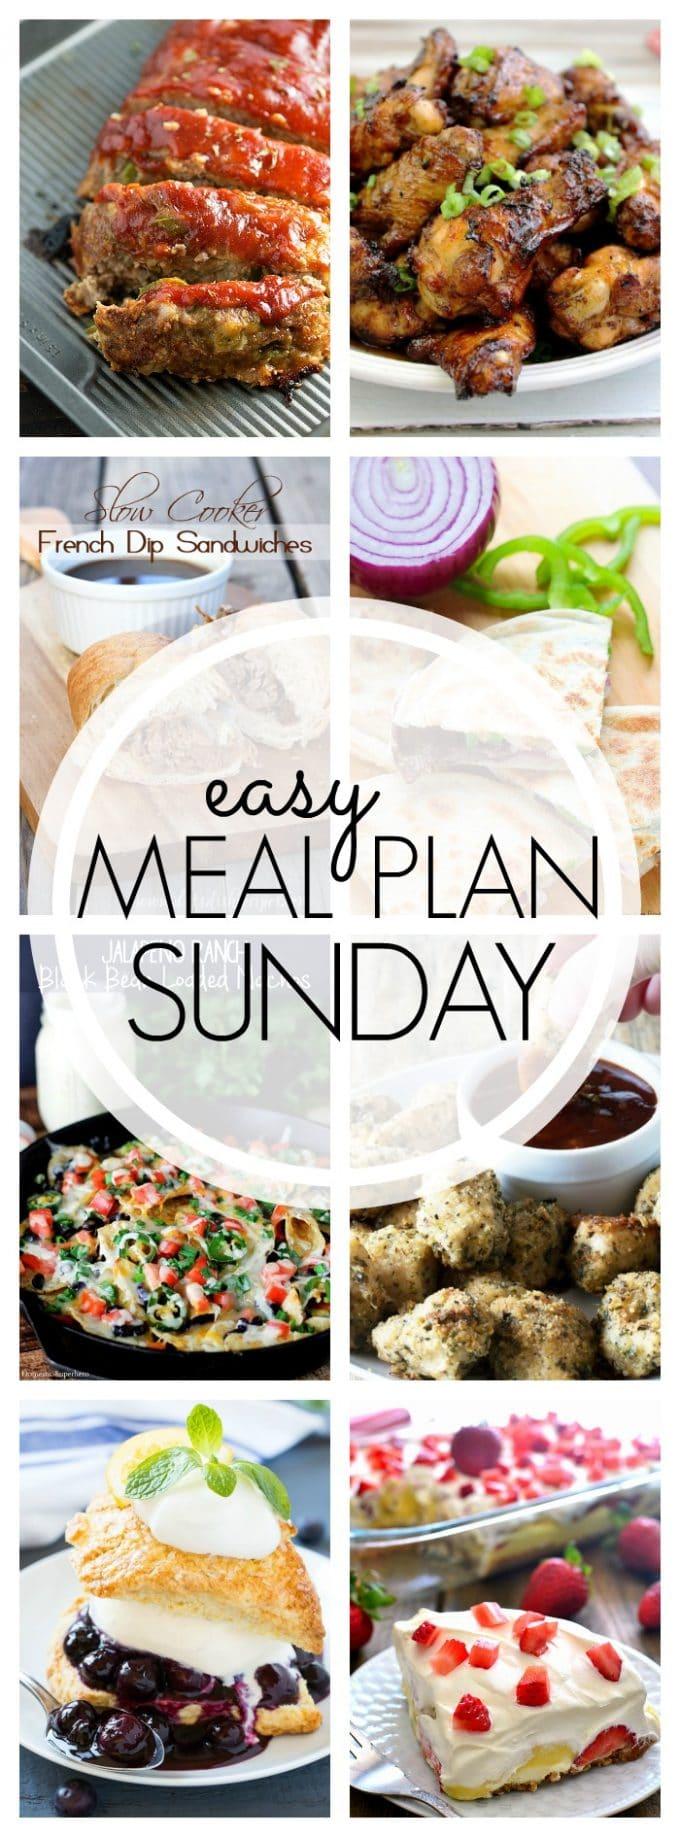 Easy Meal Plan Sunday Week 52